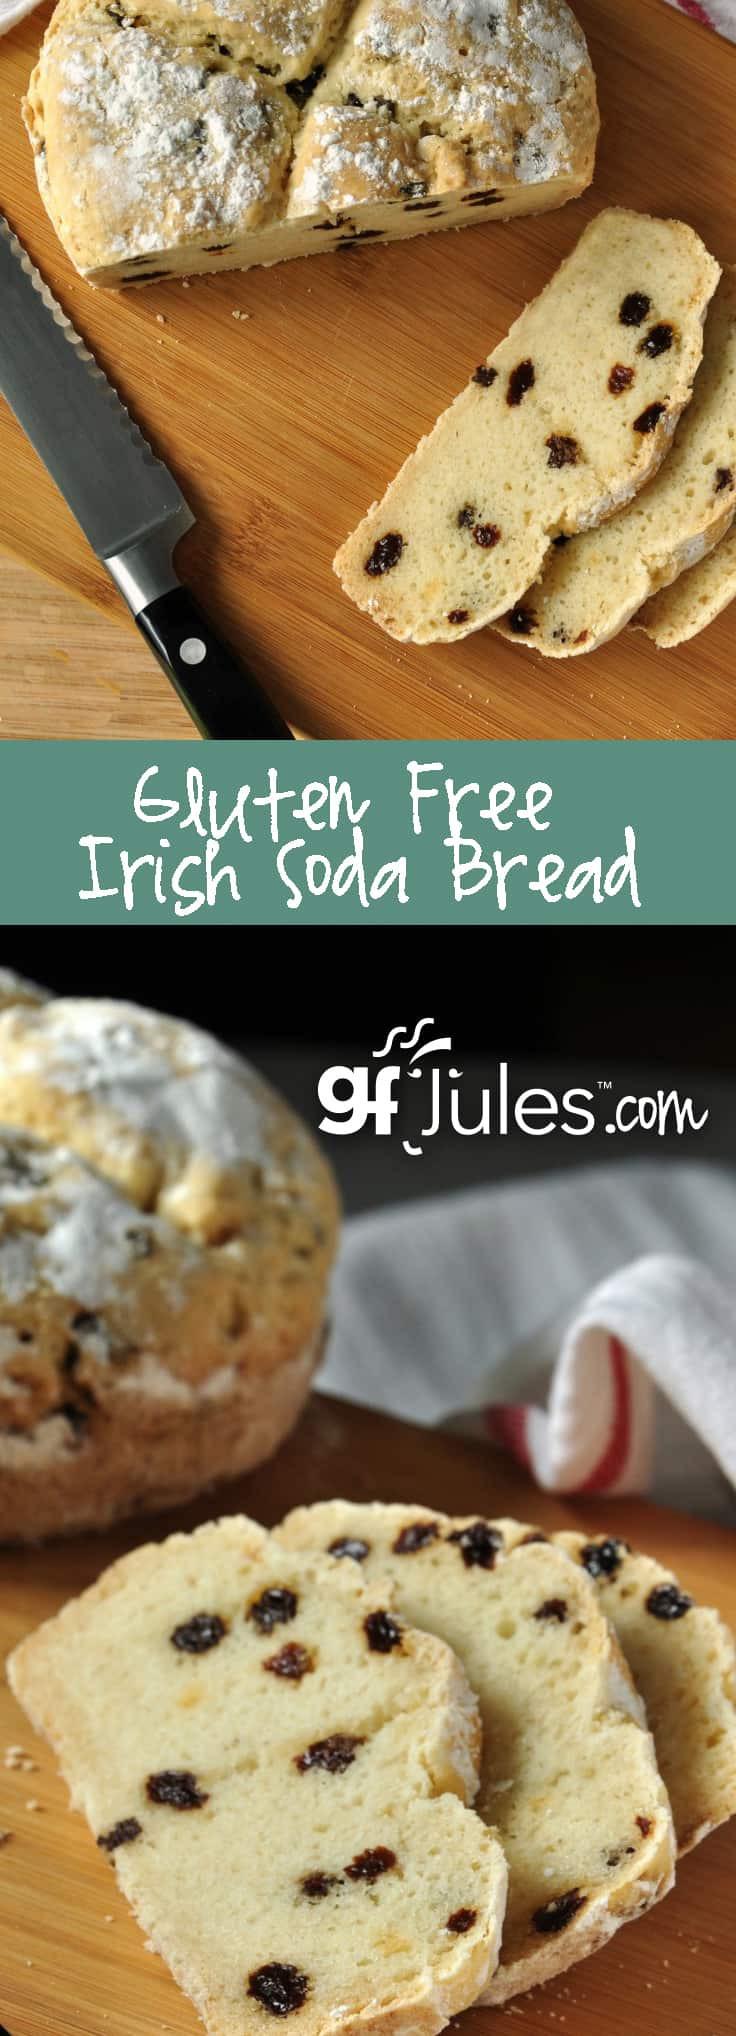 Gluten Free Irish Soda Bread  Easy Gluten Free Irish Soda Bread Gluten free recipes